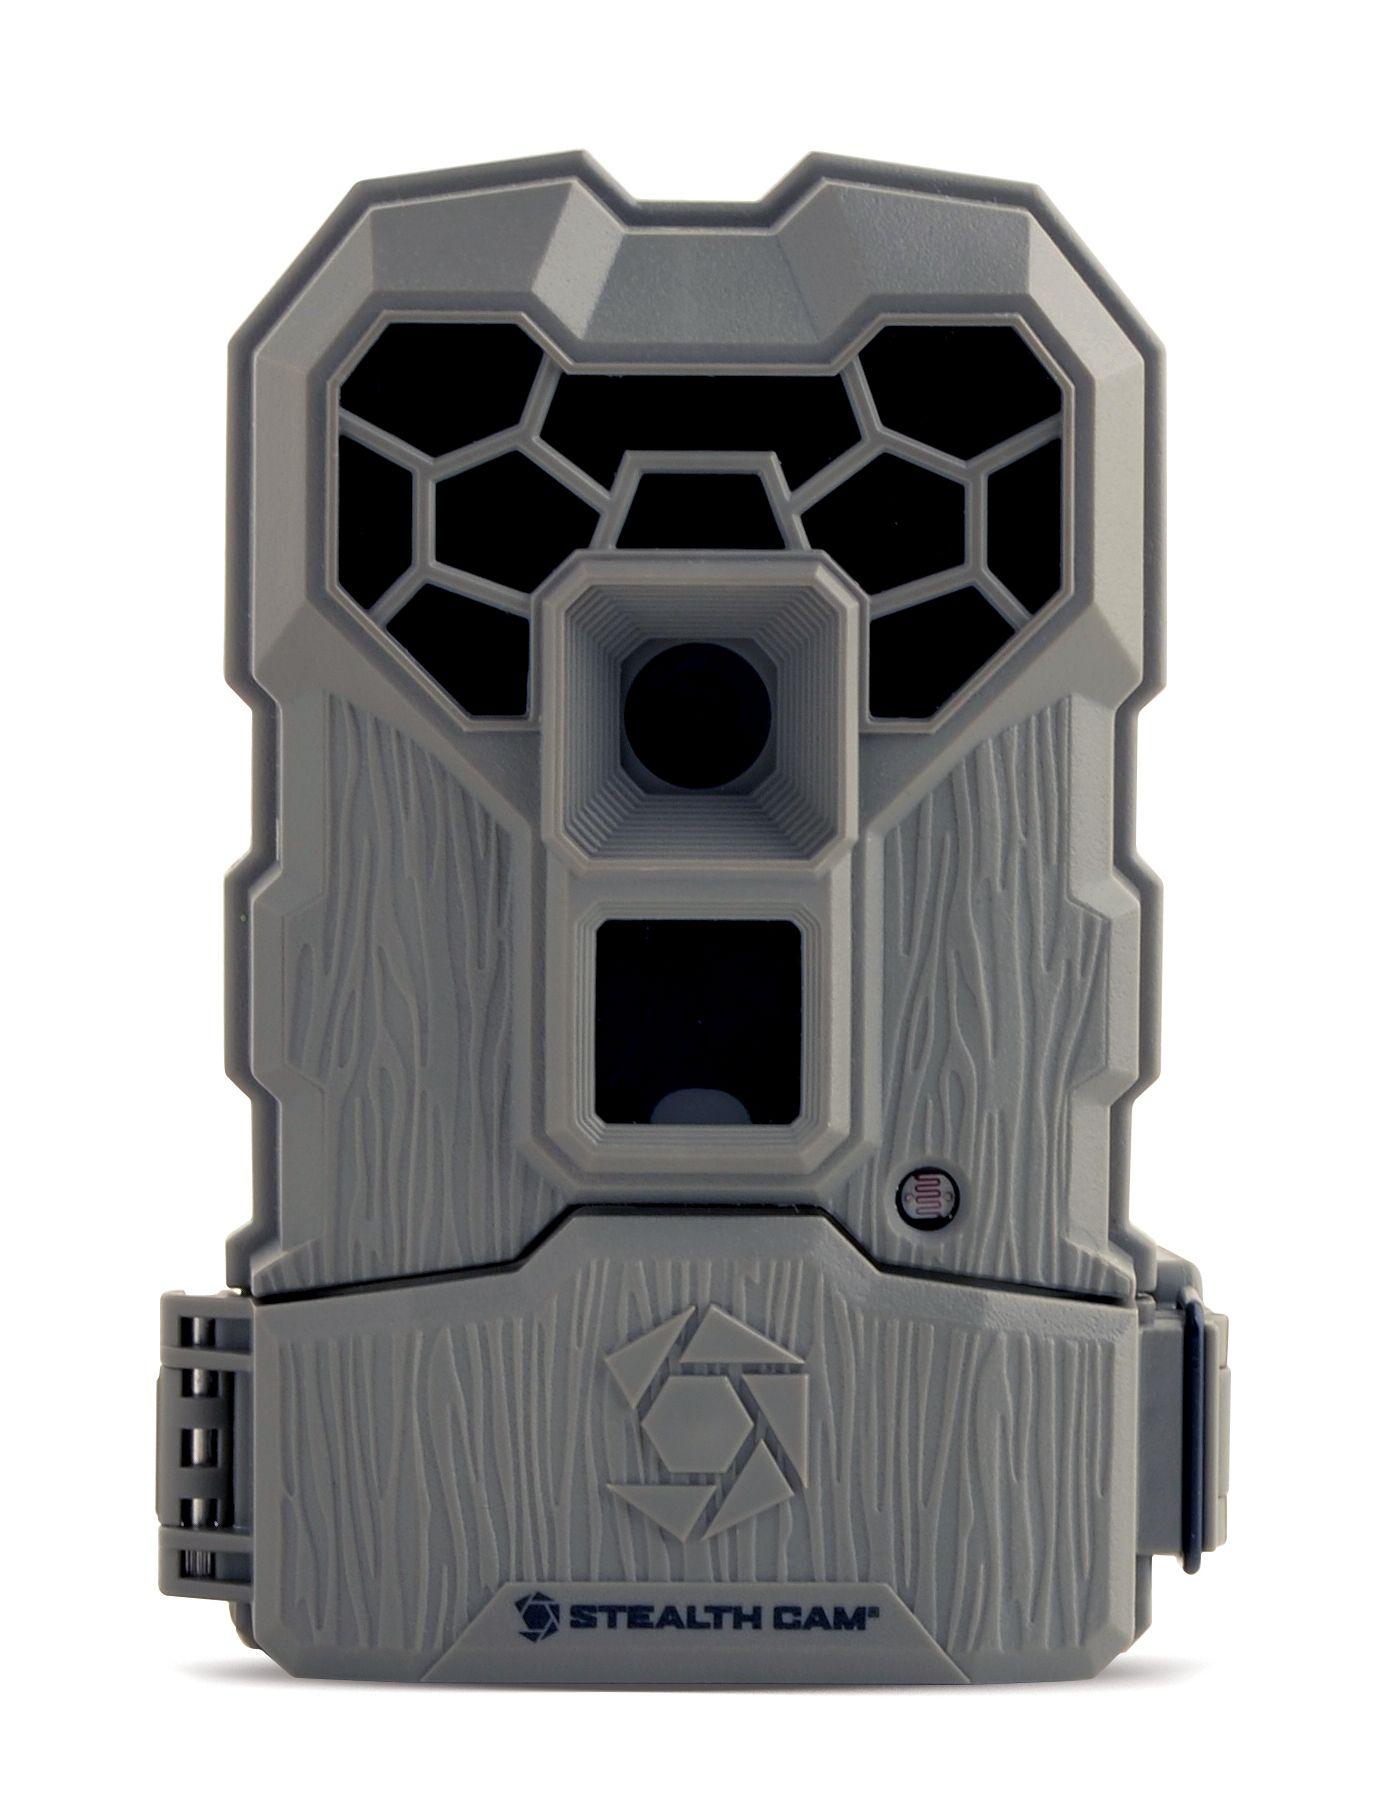 Stealth Cam QS12 Trail Camera – 10MP